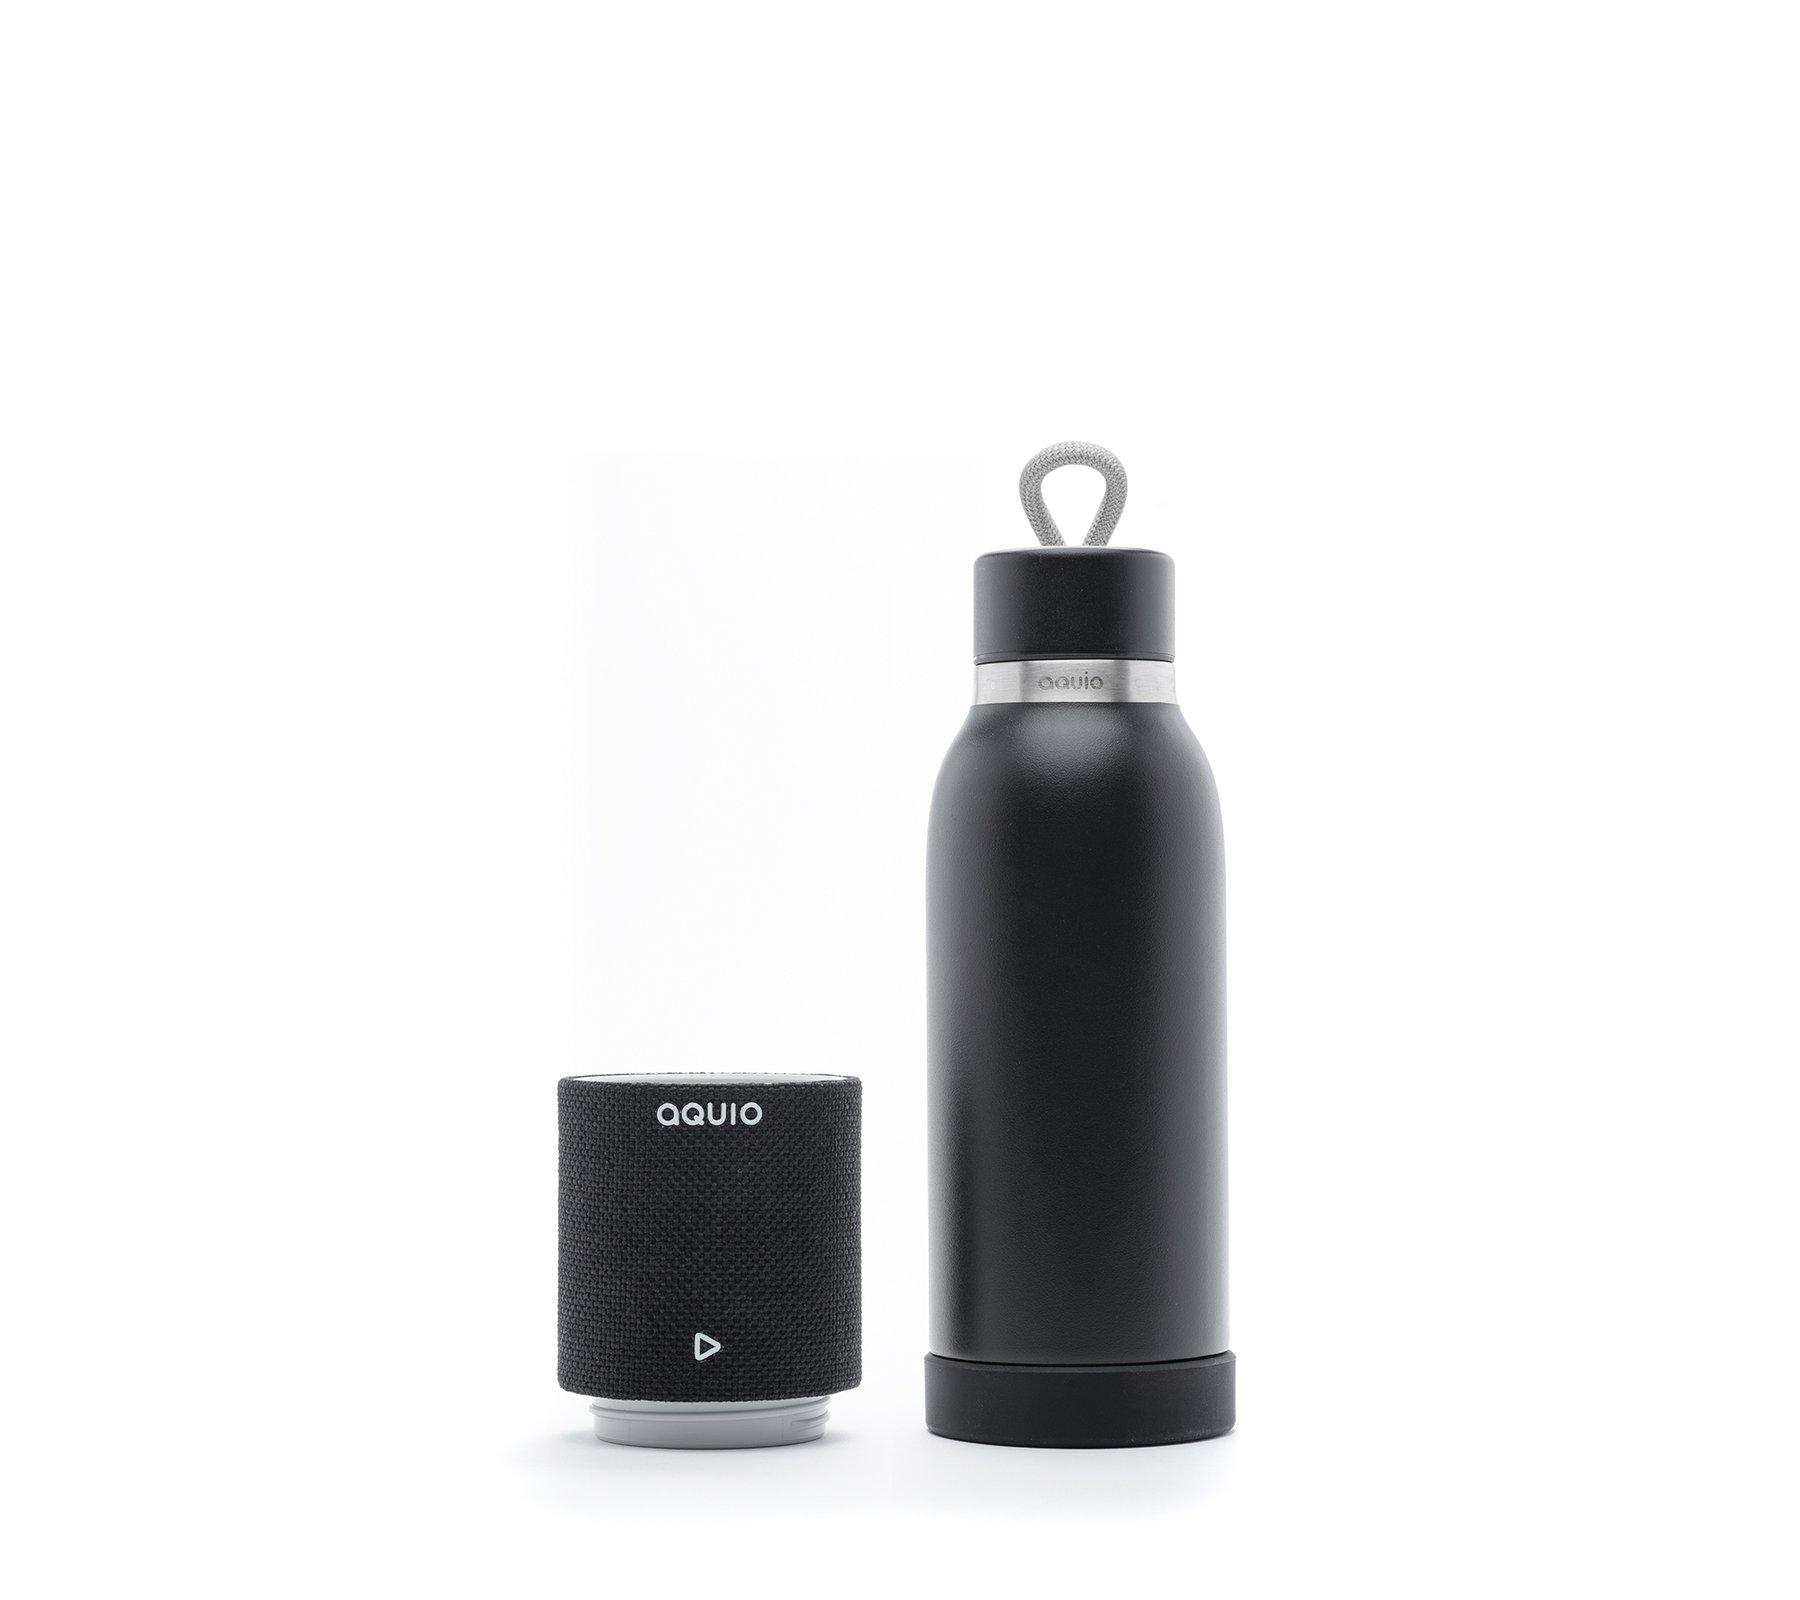 a217f66537 iHome iBTB2 Aquio Double Wall Insulated Bottle + Waterproof ...